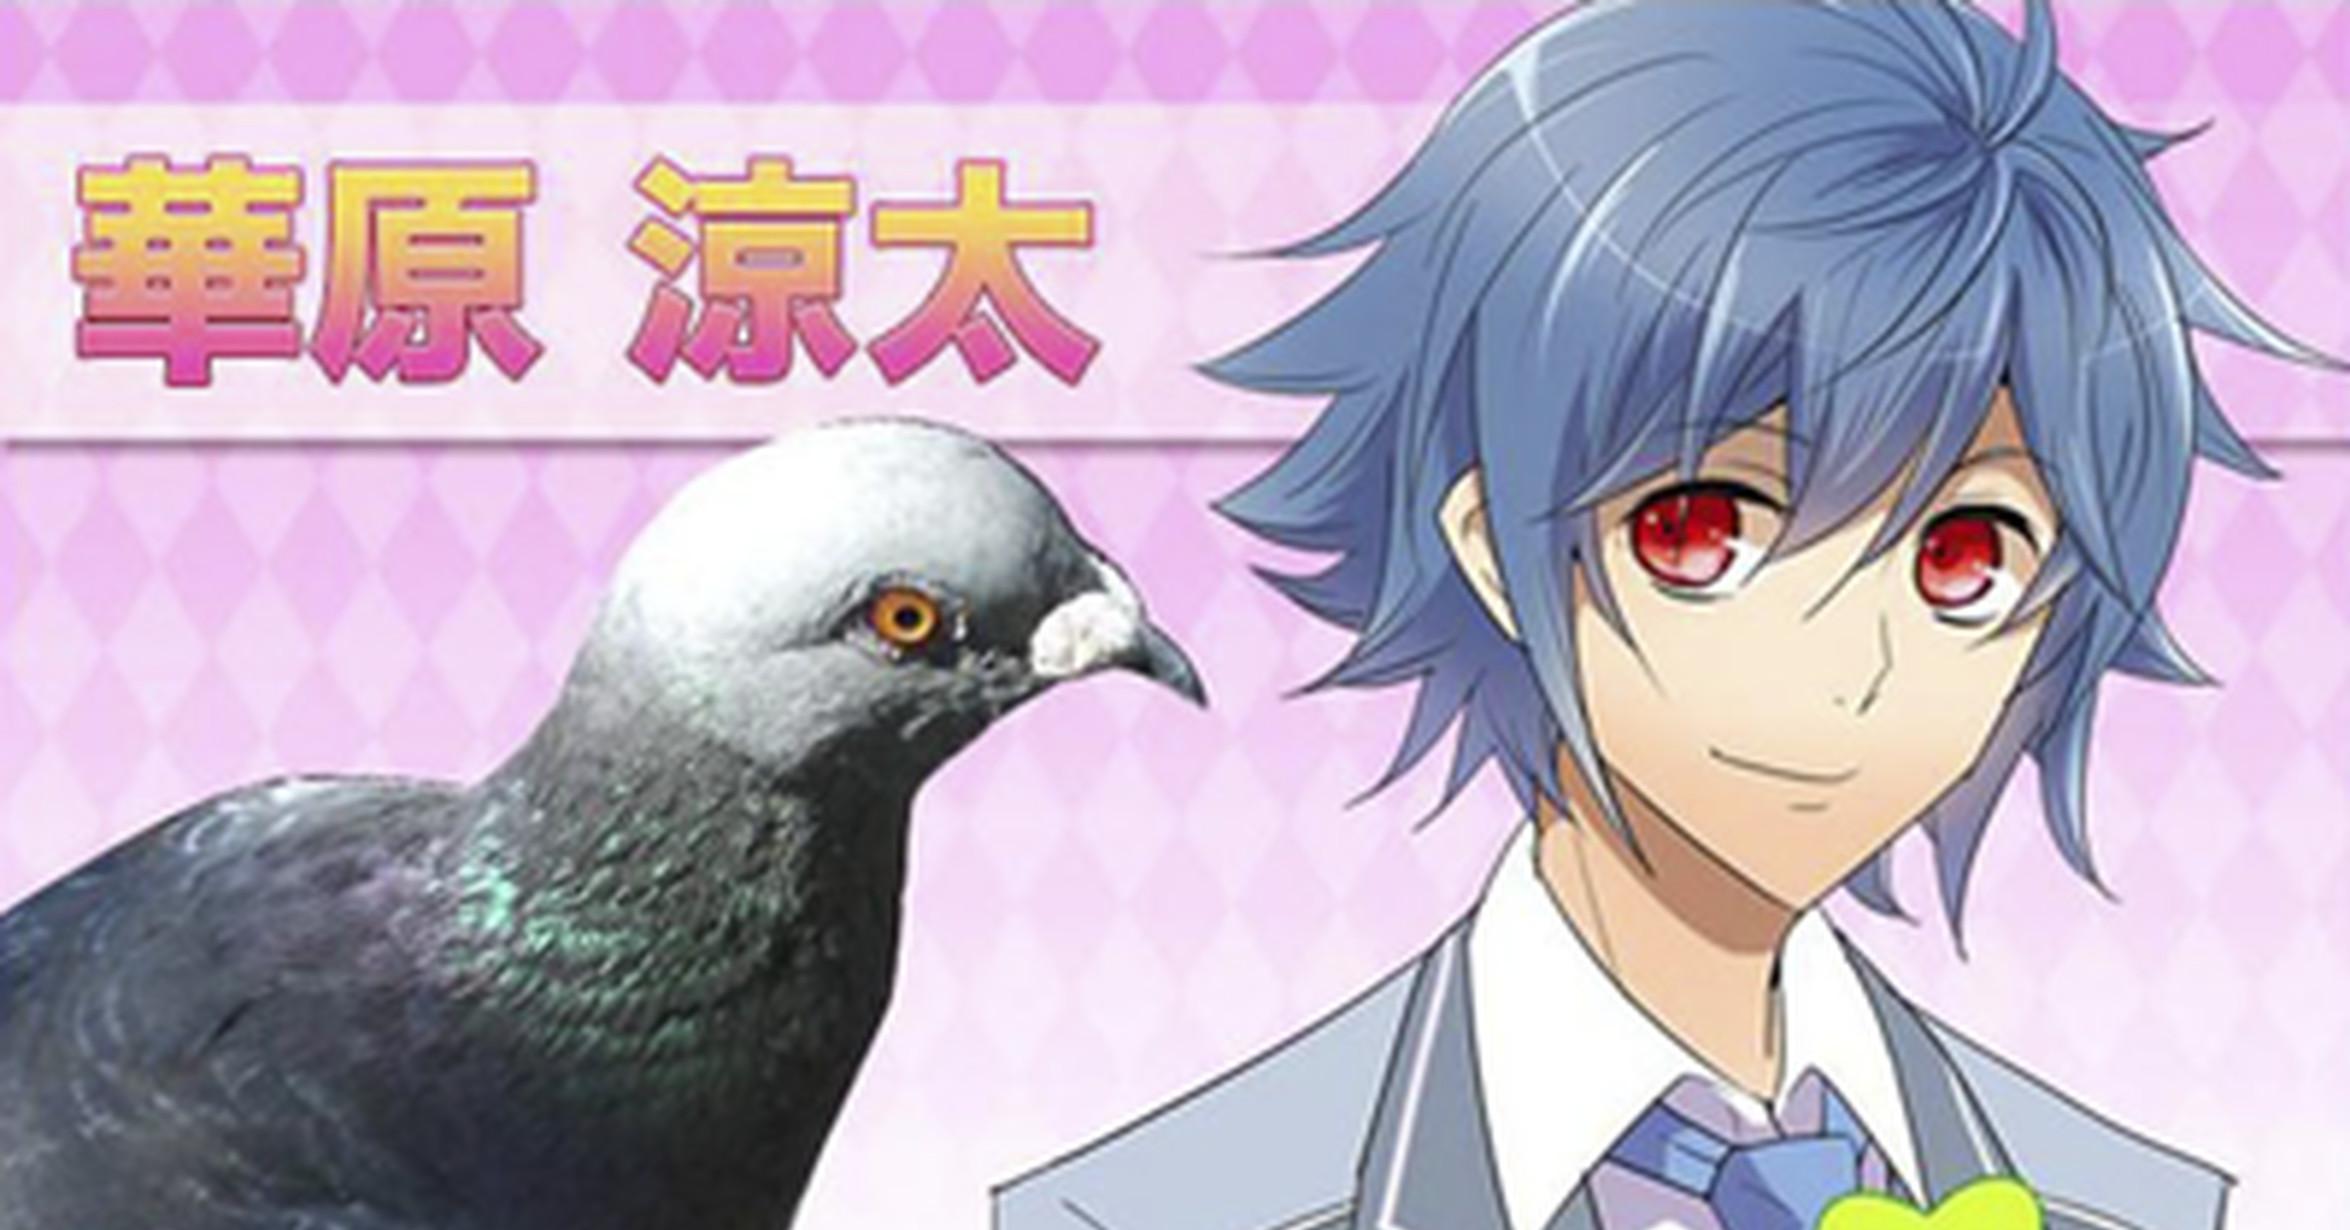 Pigeon dating sim Hatoful Boyfriend snuggles up to Steam ...